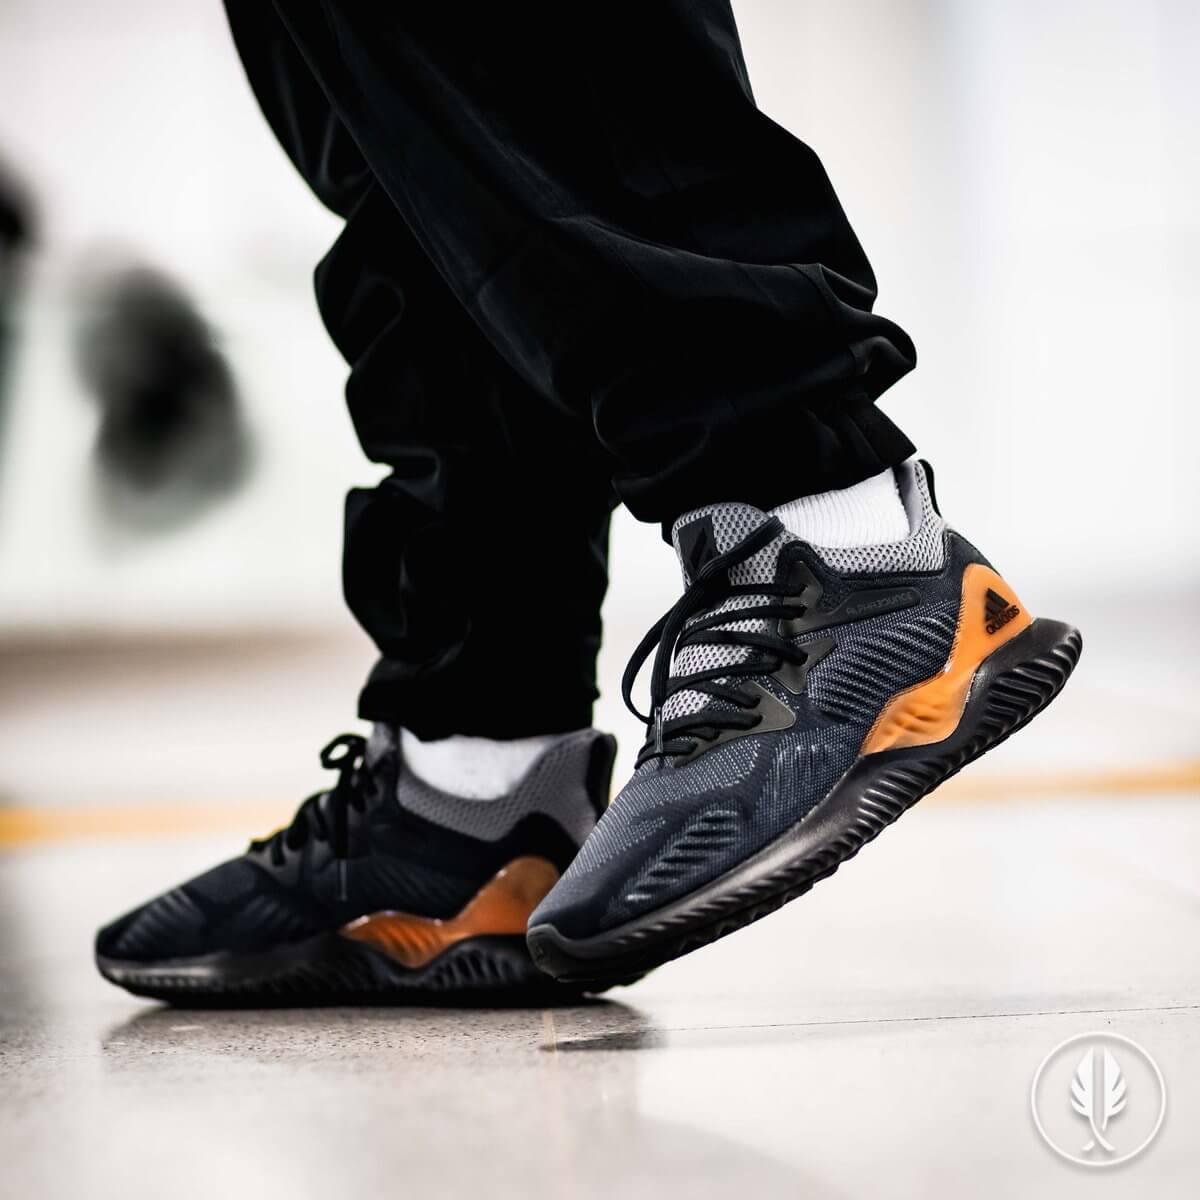 Giày Adidas Alphabounce Beyond nam nữ thể thao, giá tốt | Ruby Store